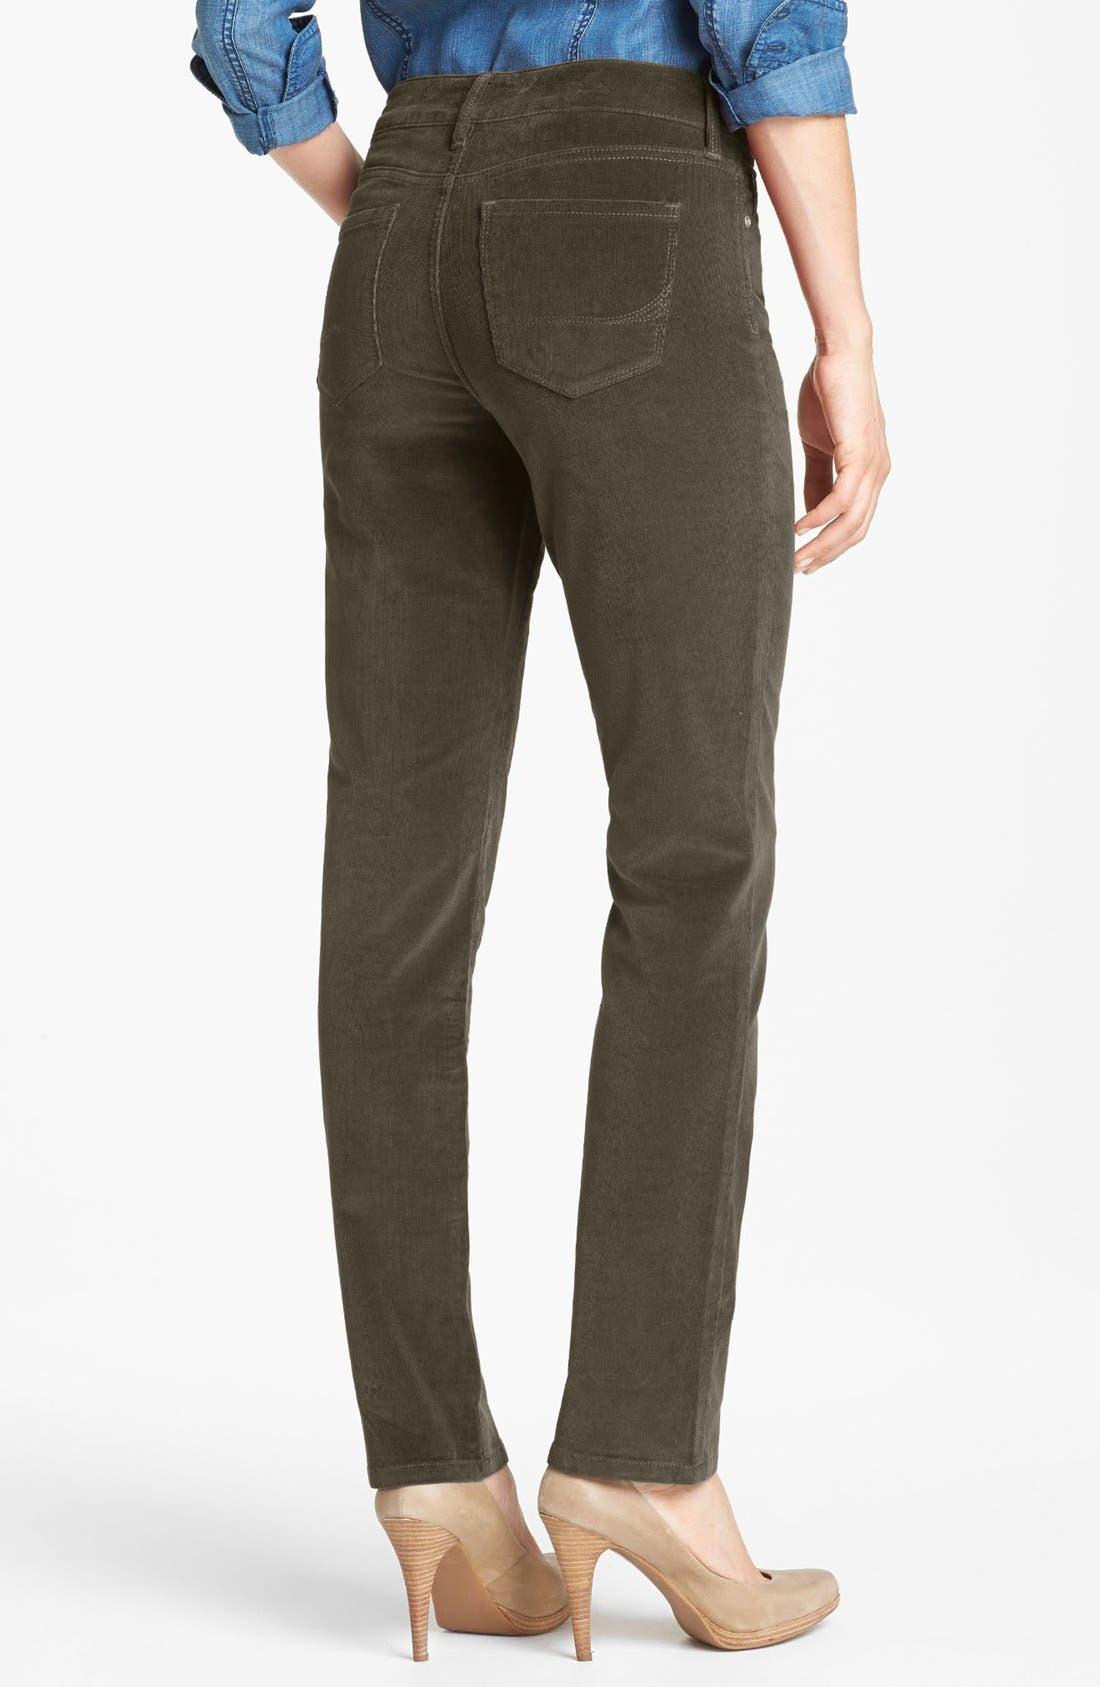 Alternate Image 2  - NYDJ 'Sheri' Colored Stretch Corduroy Skinny Pants (Regular & Petite)